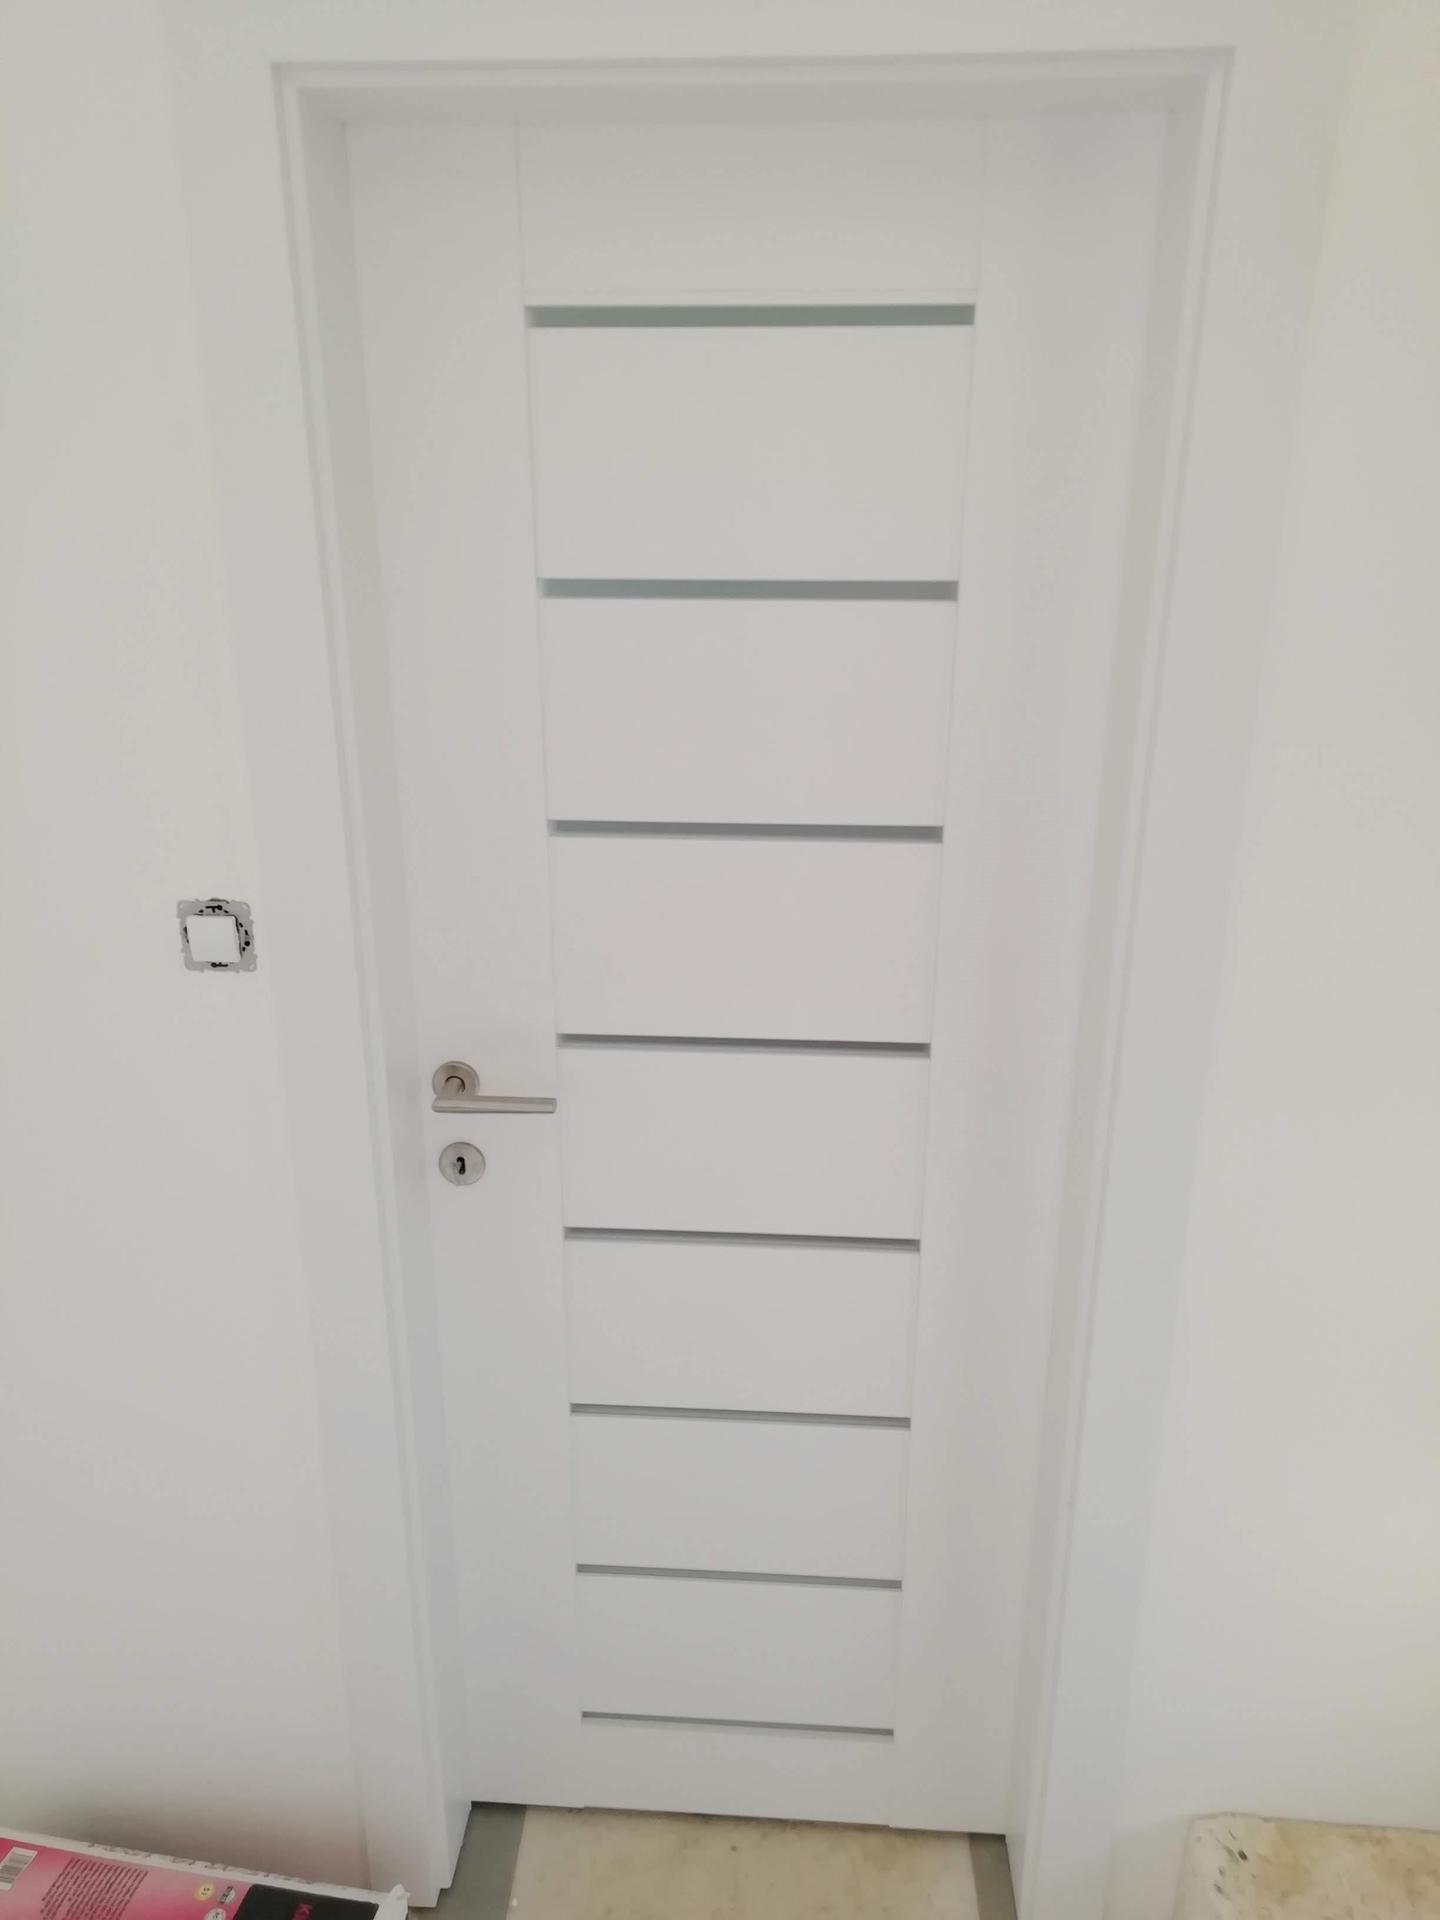 Náš dům na větrné hůrce - A máme i dveře. ABH design Brno.